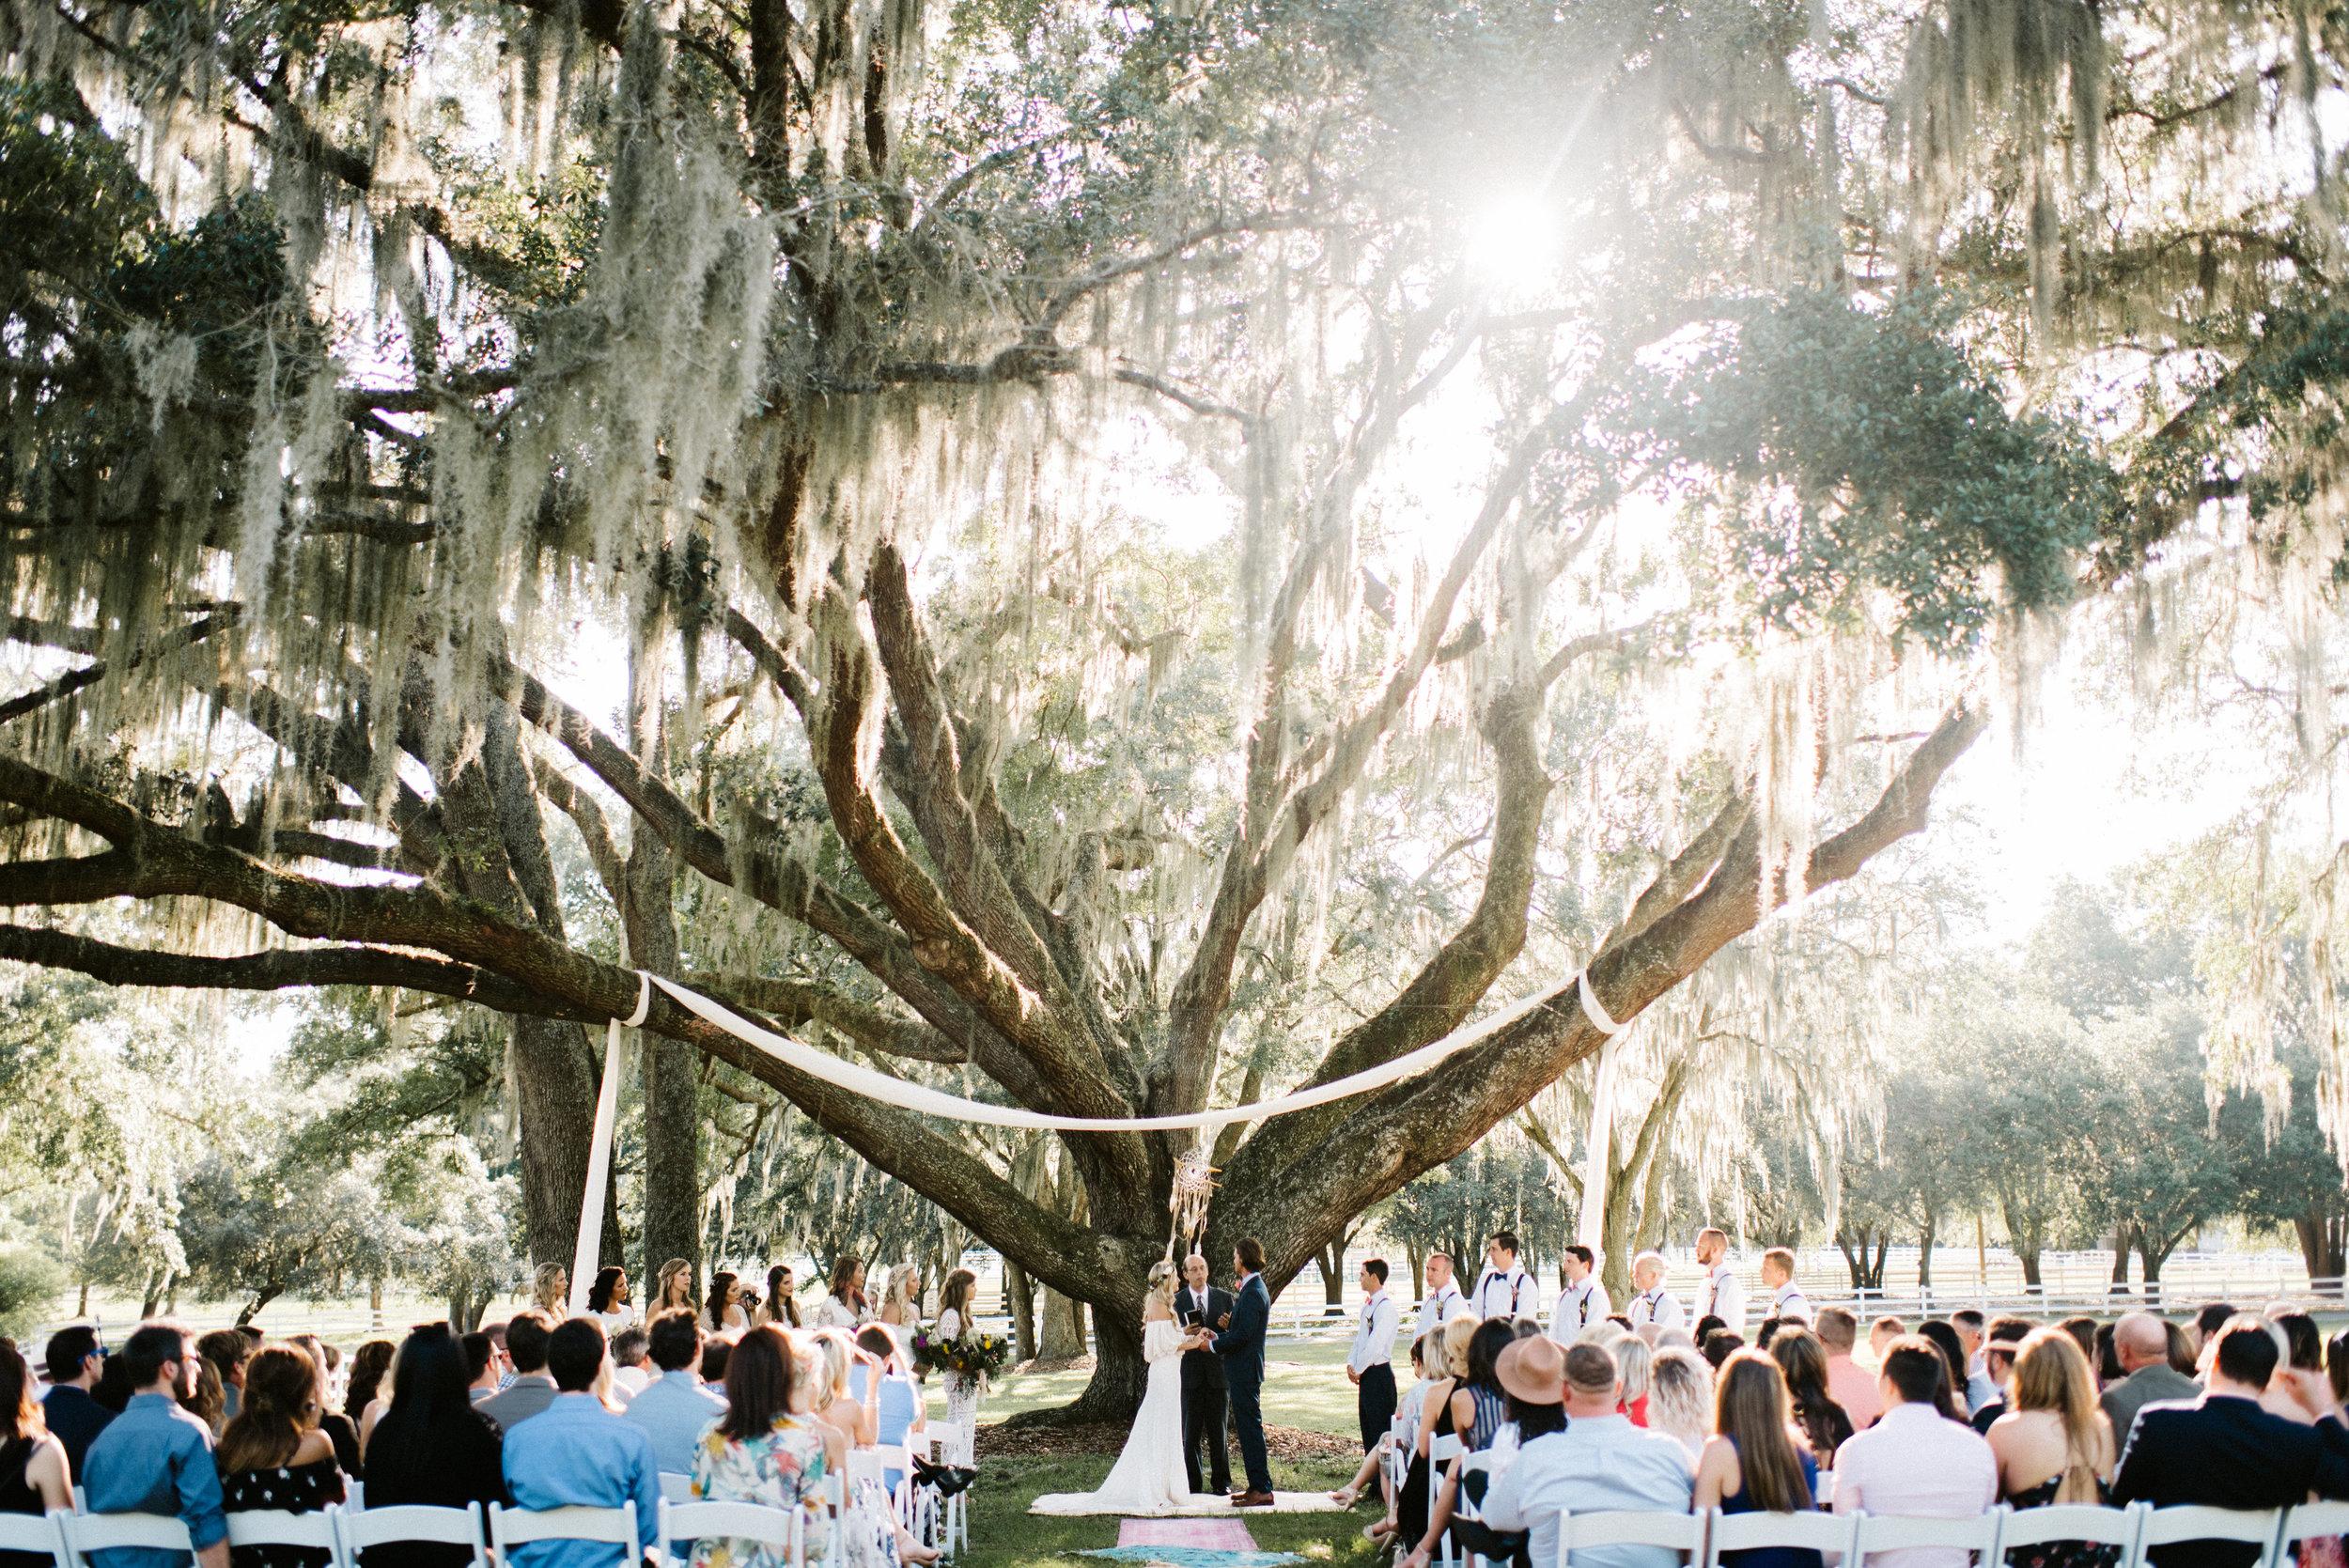 Outdoor wedding ceremony site, Tampa